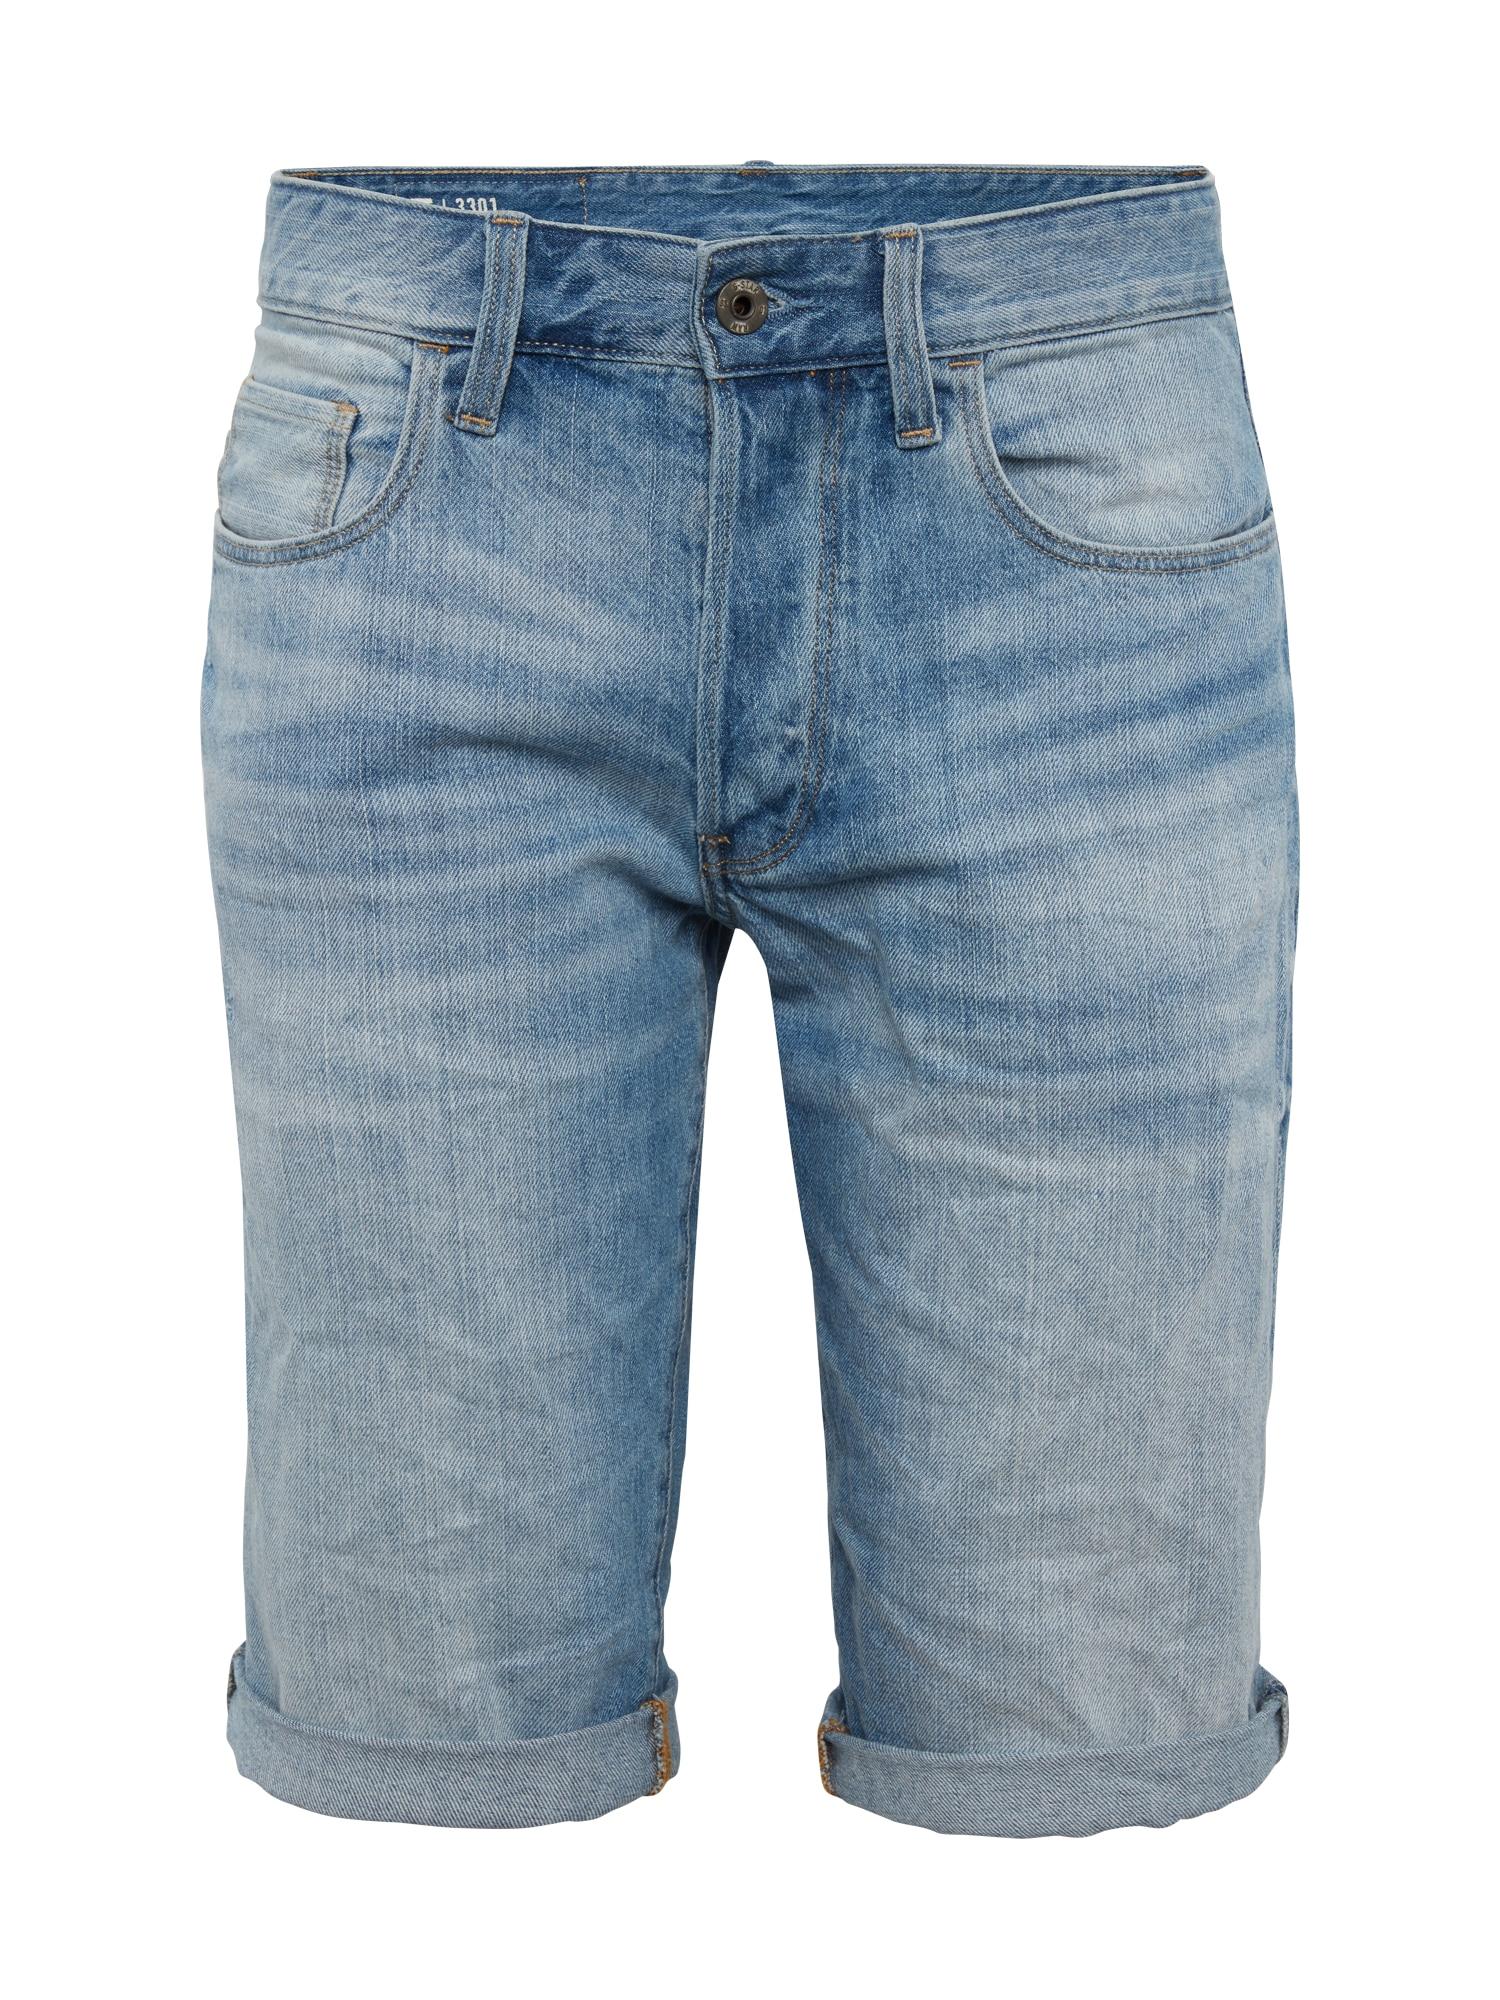 G-Star RAW Džinsai tamsiai (džinso) mėlyna